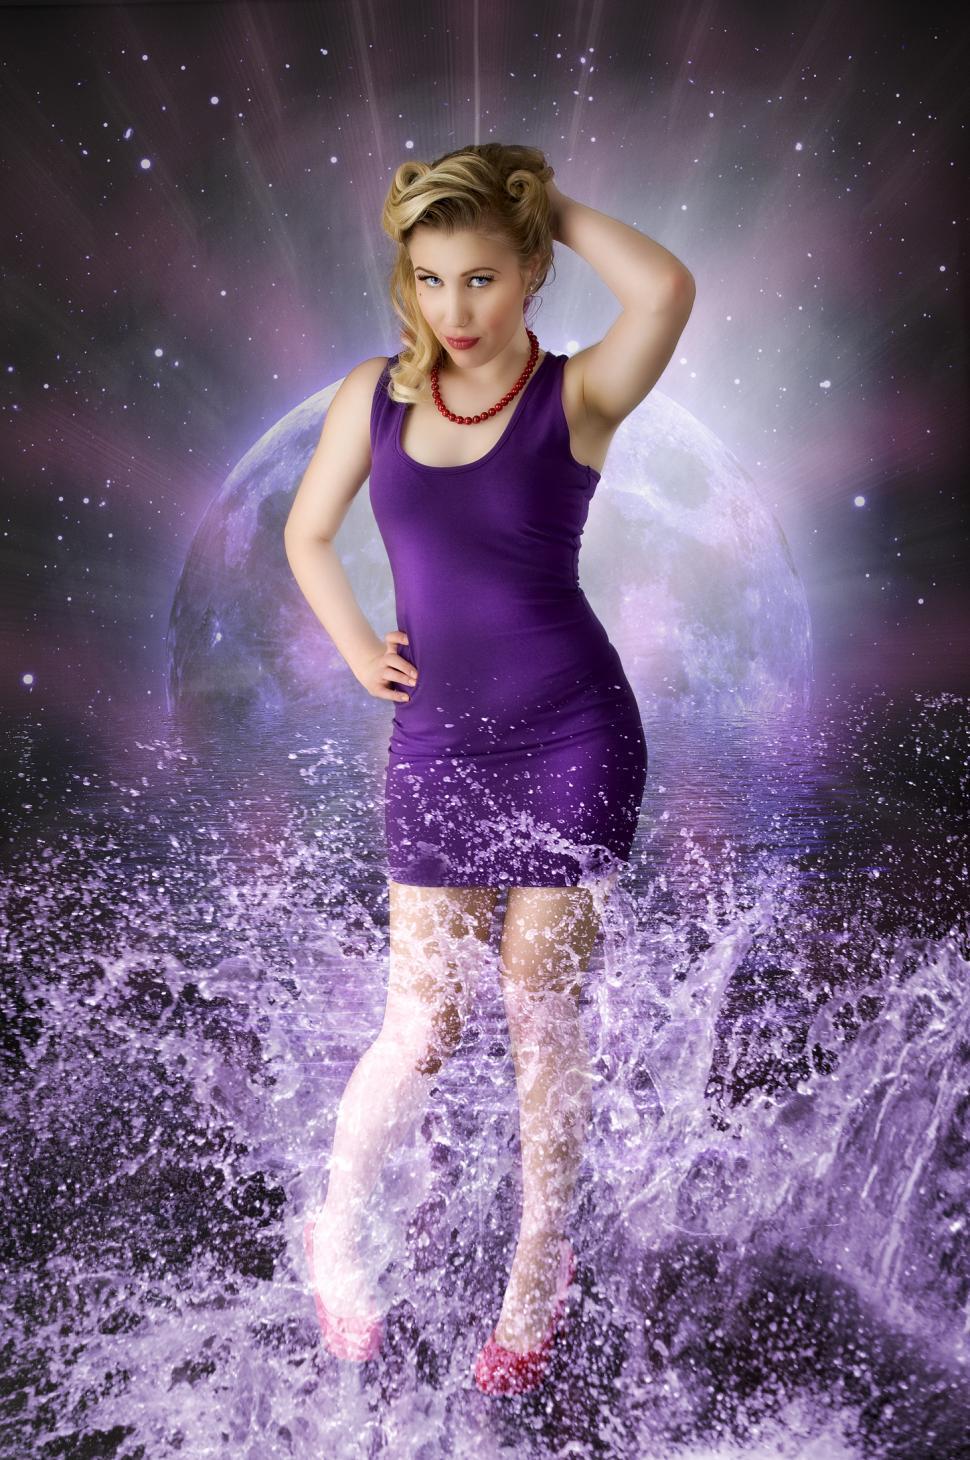 Download Free Stock Photo of Woman in space splash scene